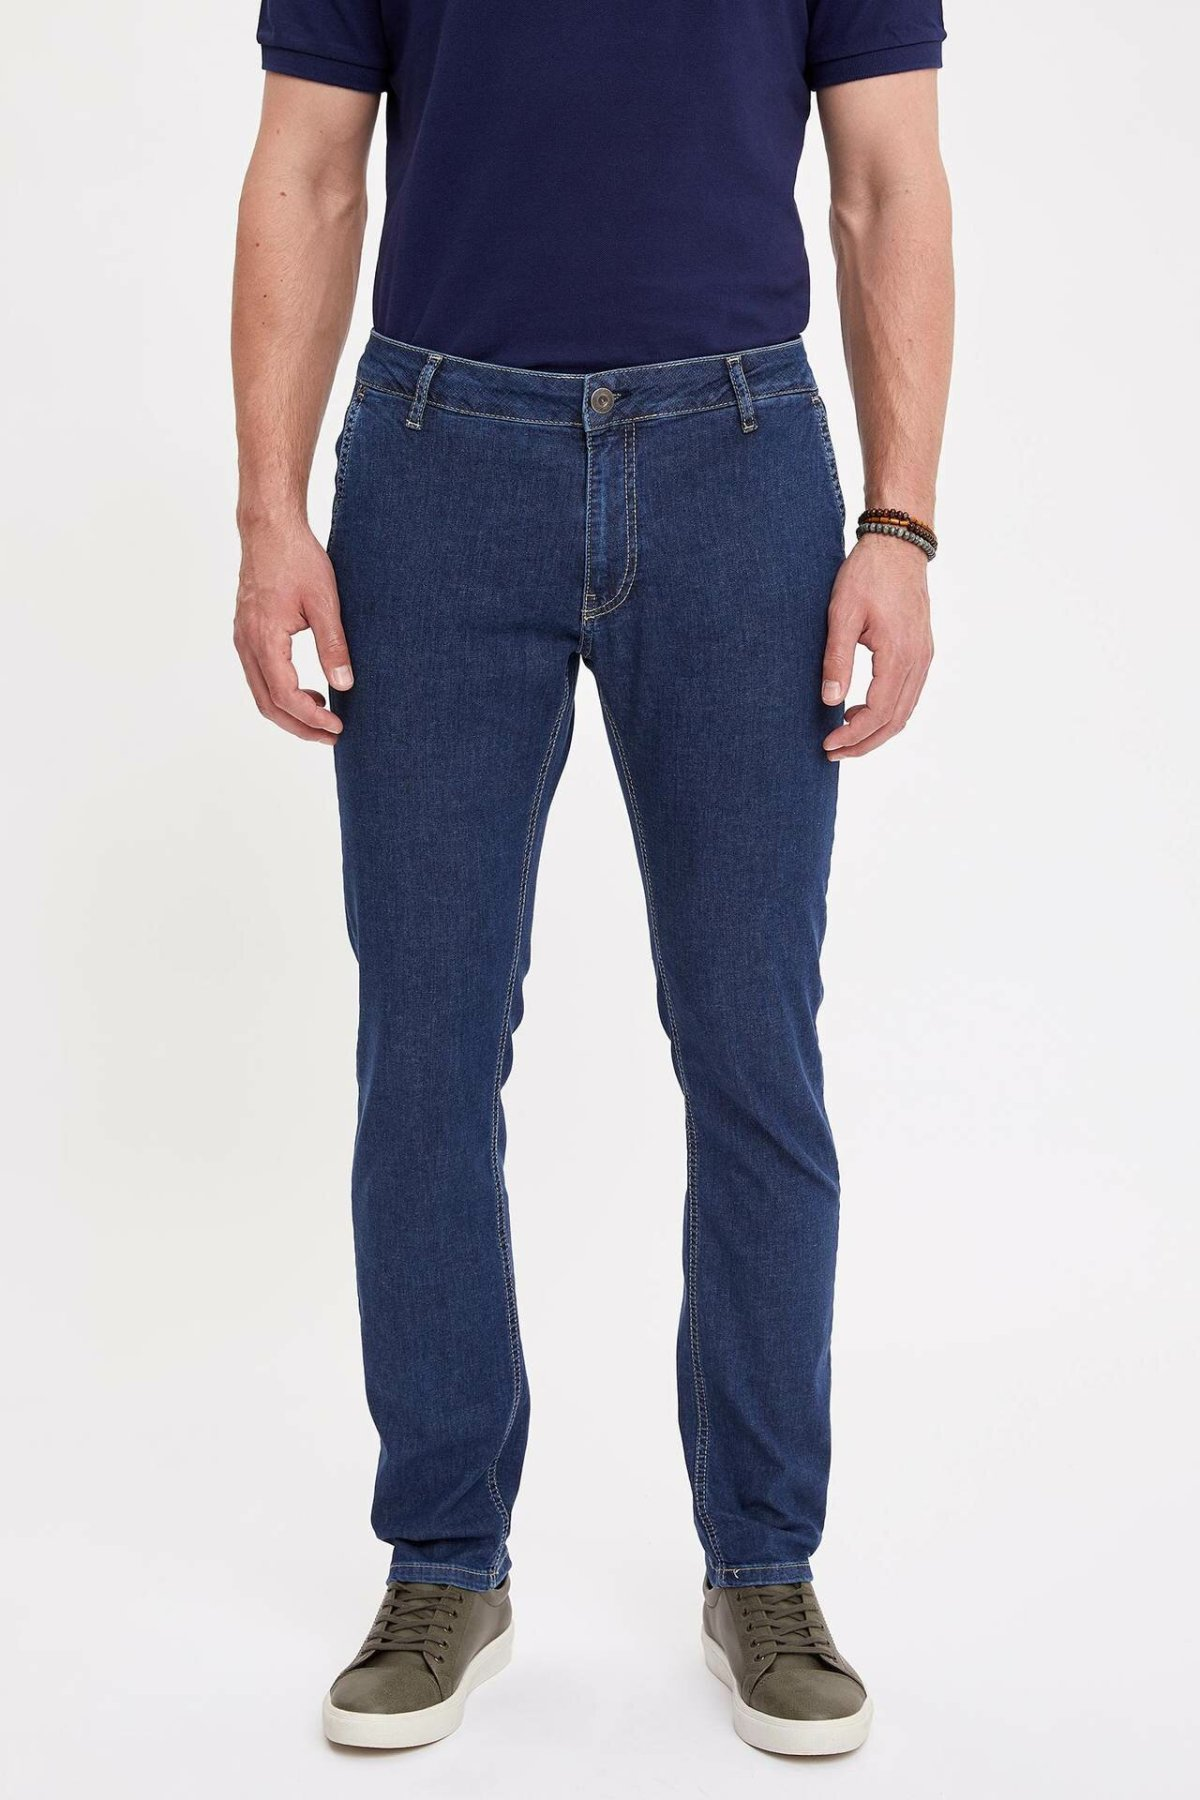 DeFacto Man Fashion Blue Simple Trousers Jeans Casual Classic Denim Jeans Casual Skinny Elasticity Pants Male -K9195AZ19SM